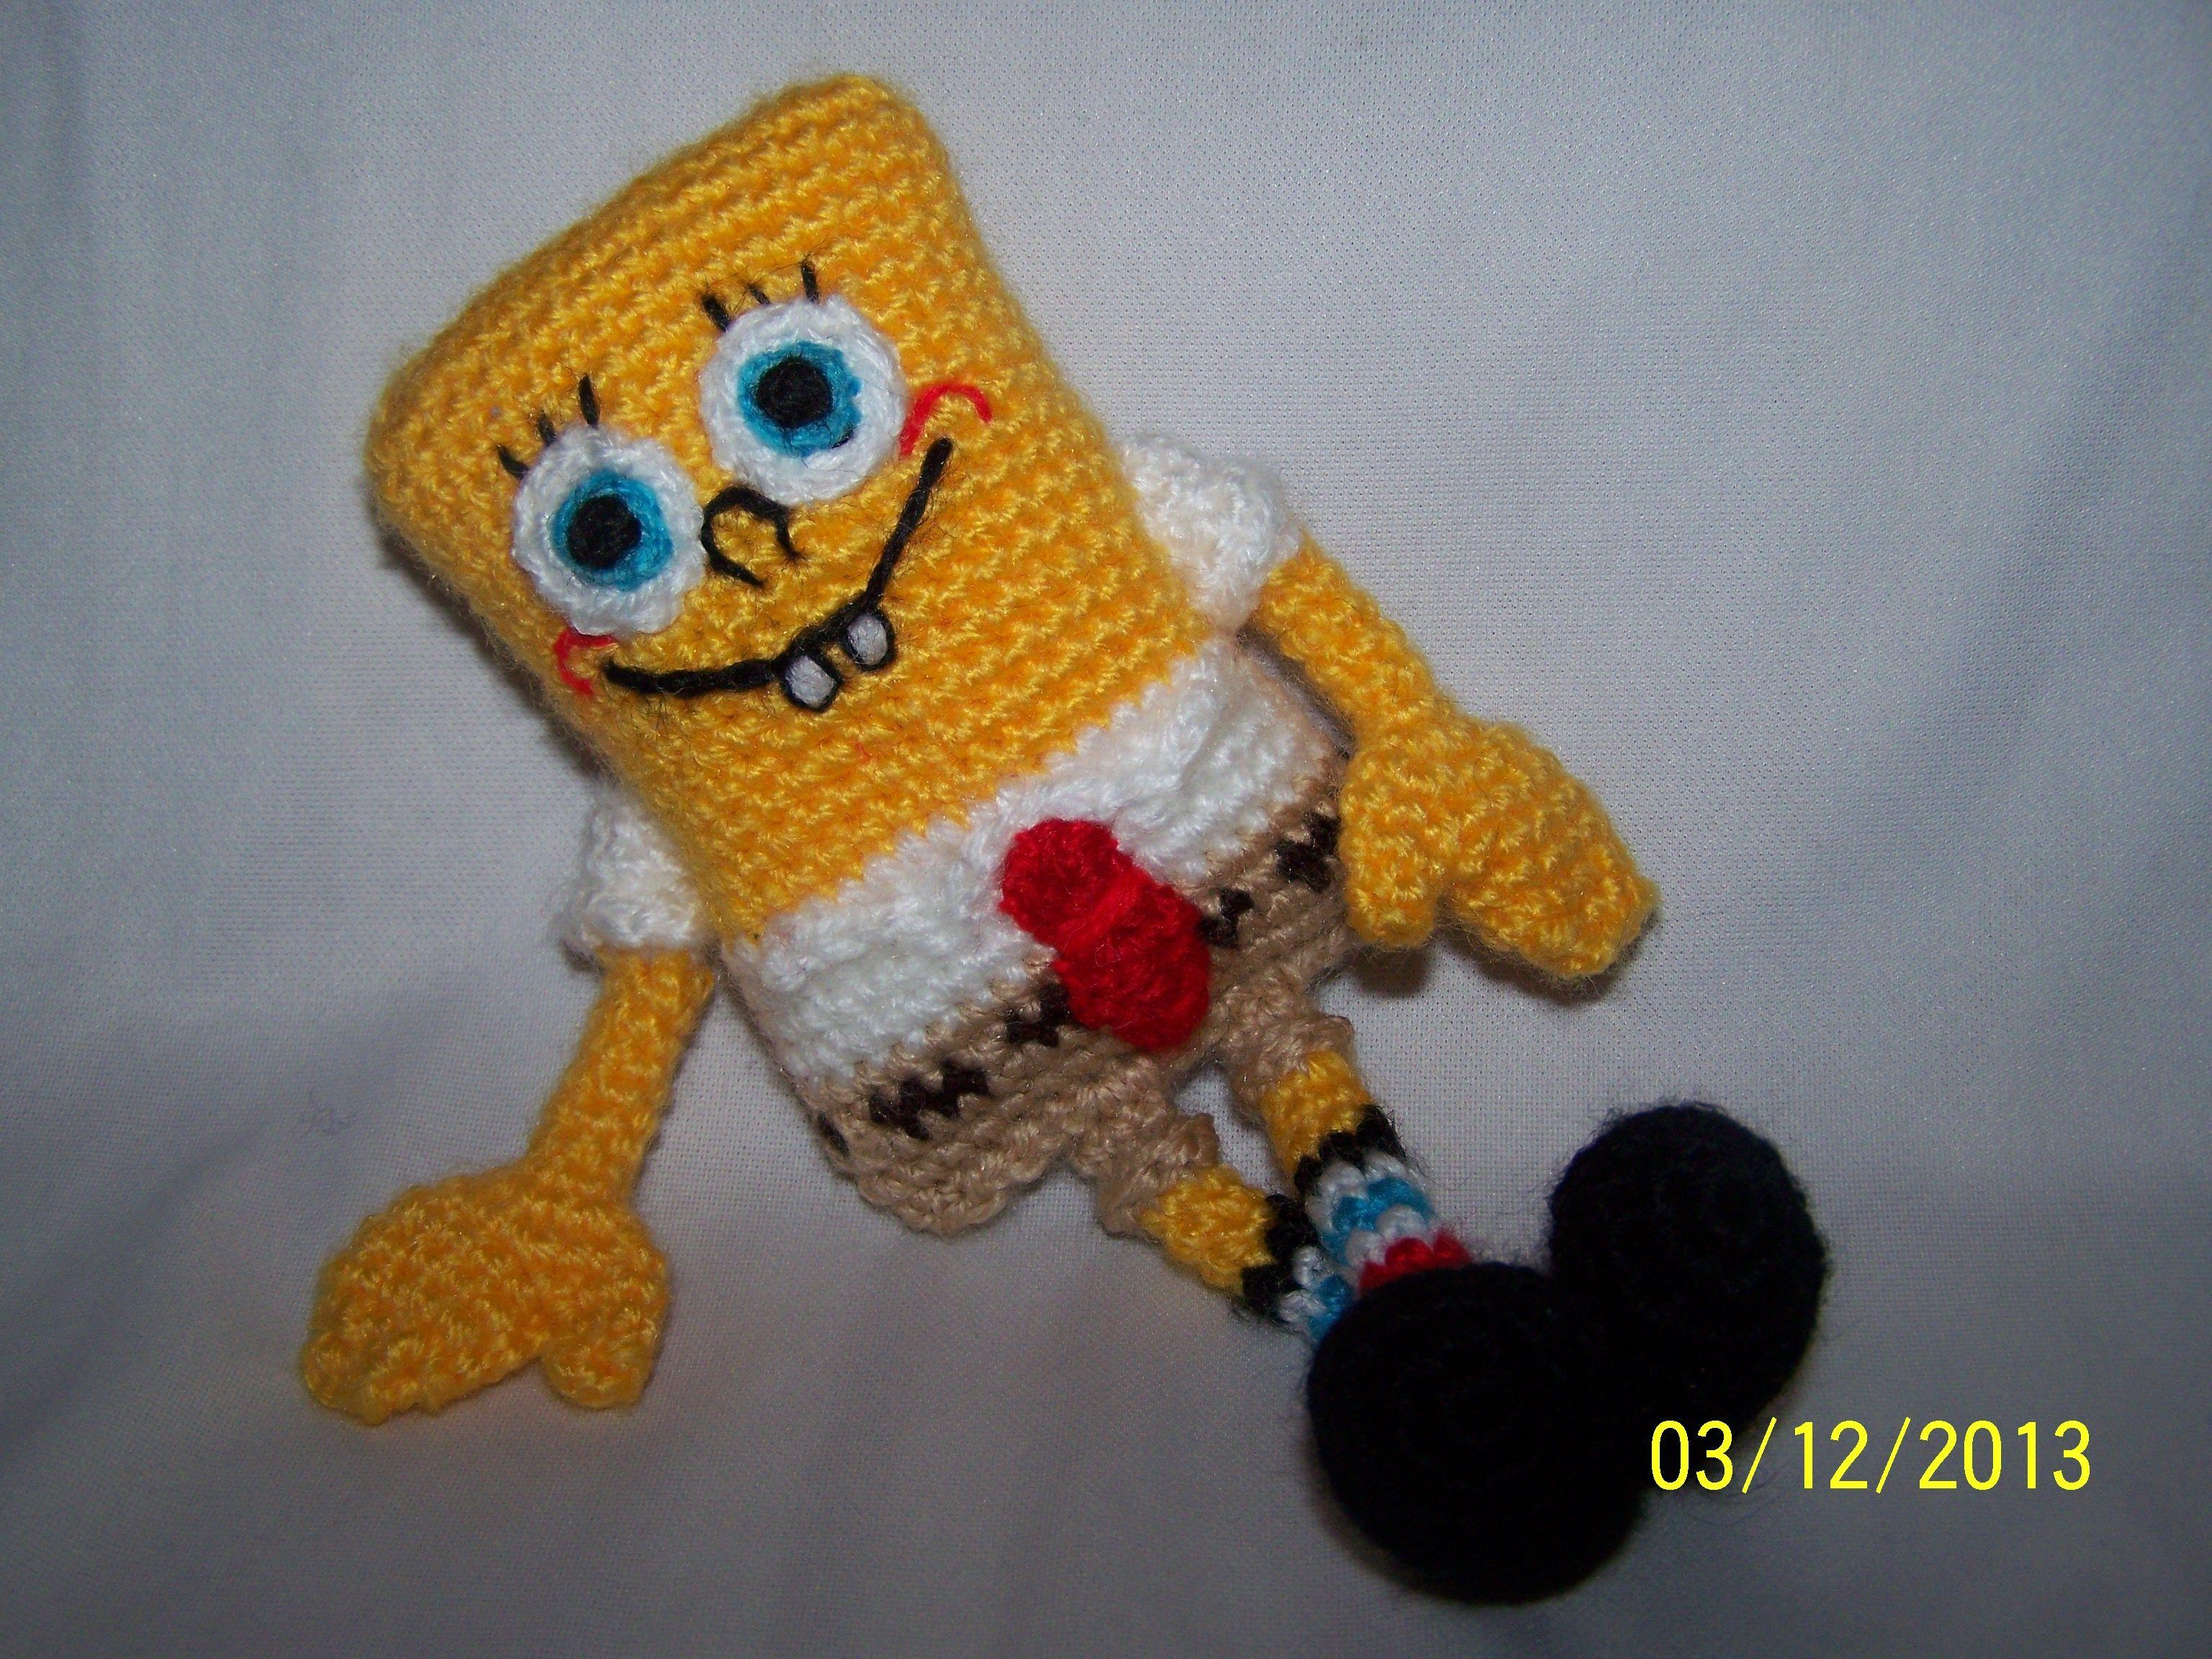 Amigurumisfanclub Kevin : Amigurumis minions bob: muñeco minion bob a crochet youtube.